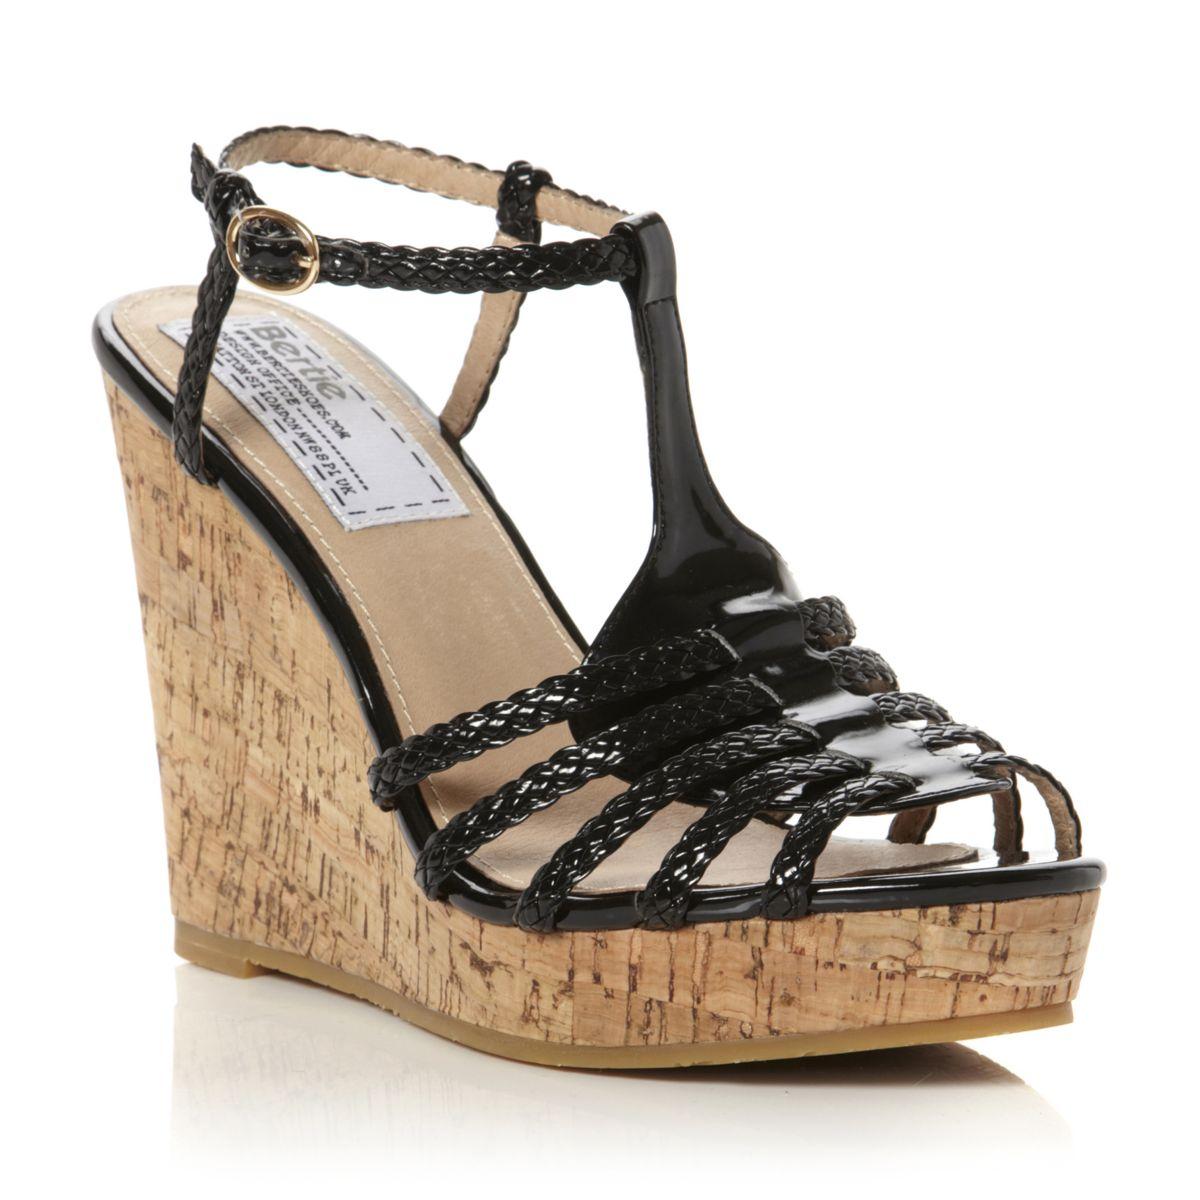 Cork Wedge Sandals Craftysandals Com